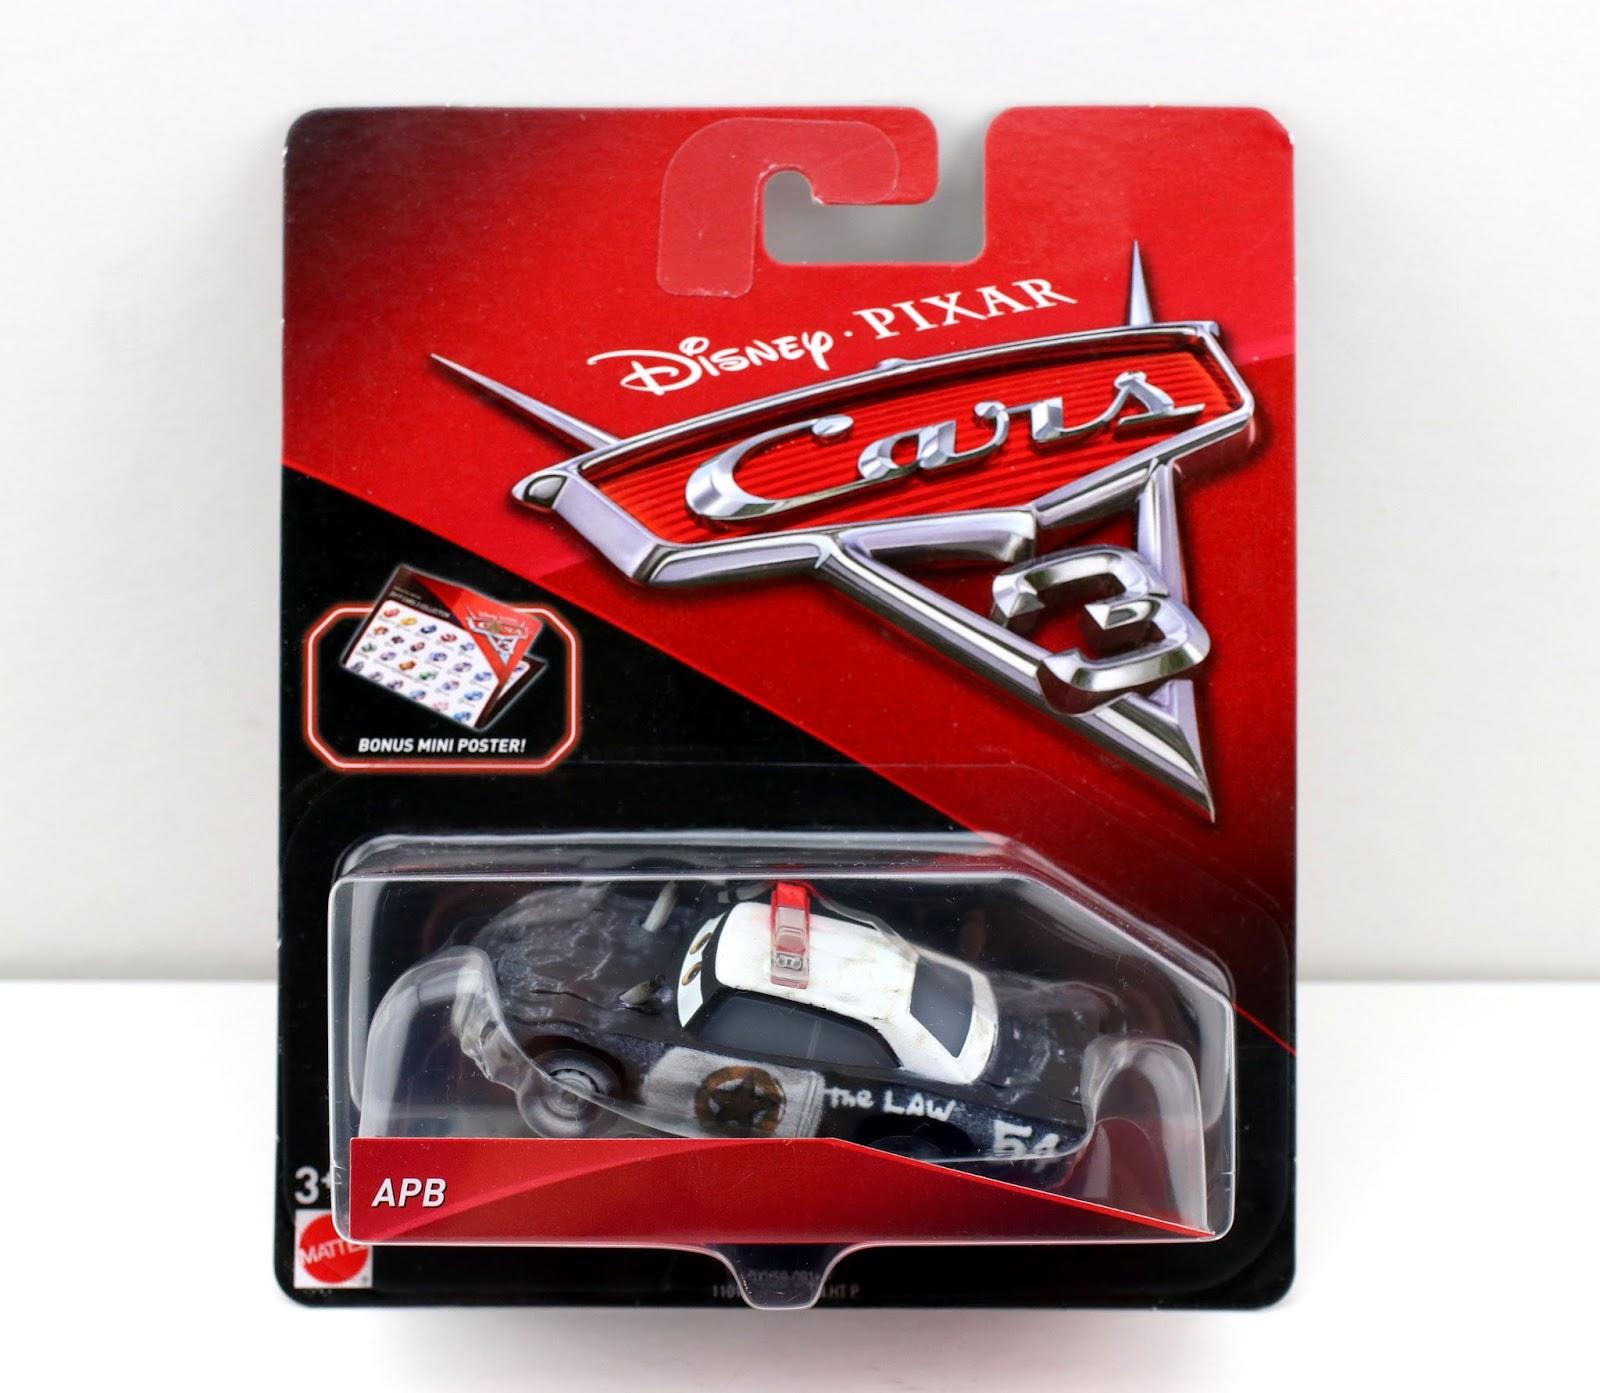 pixar cars 3 APB diecast